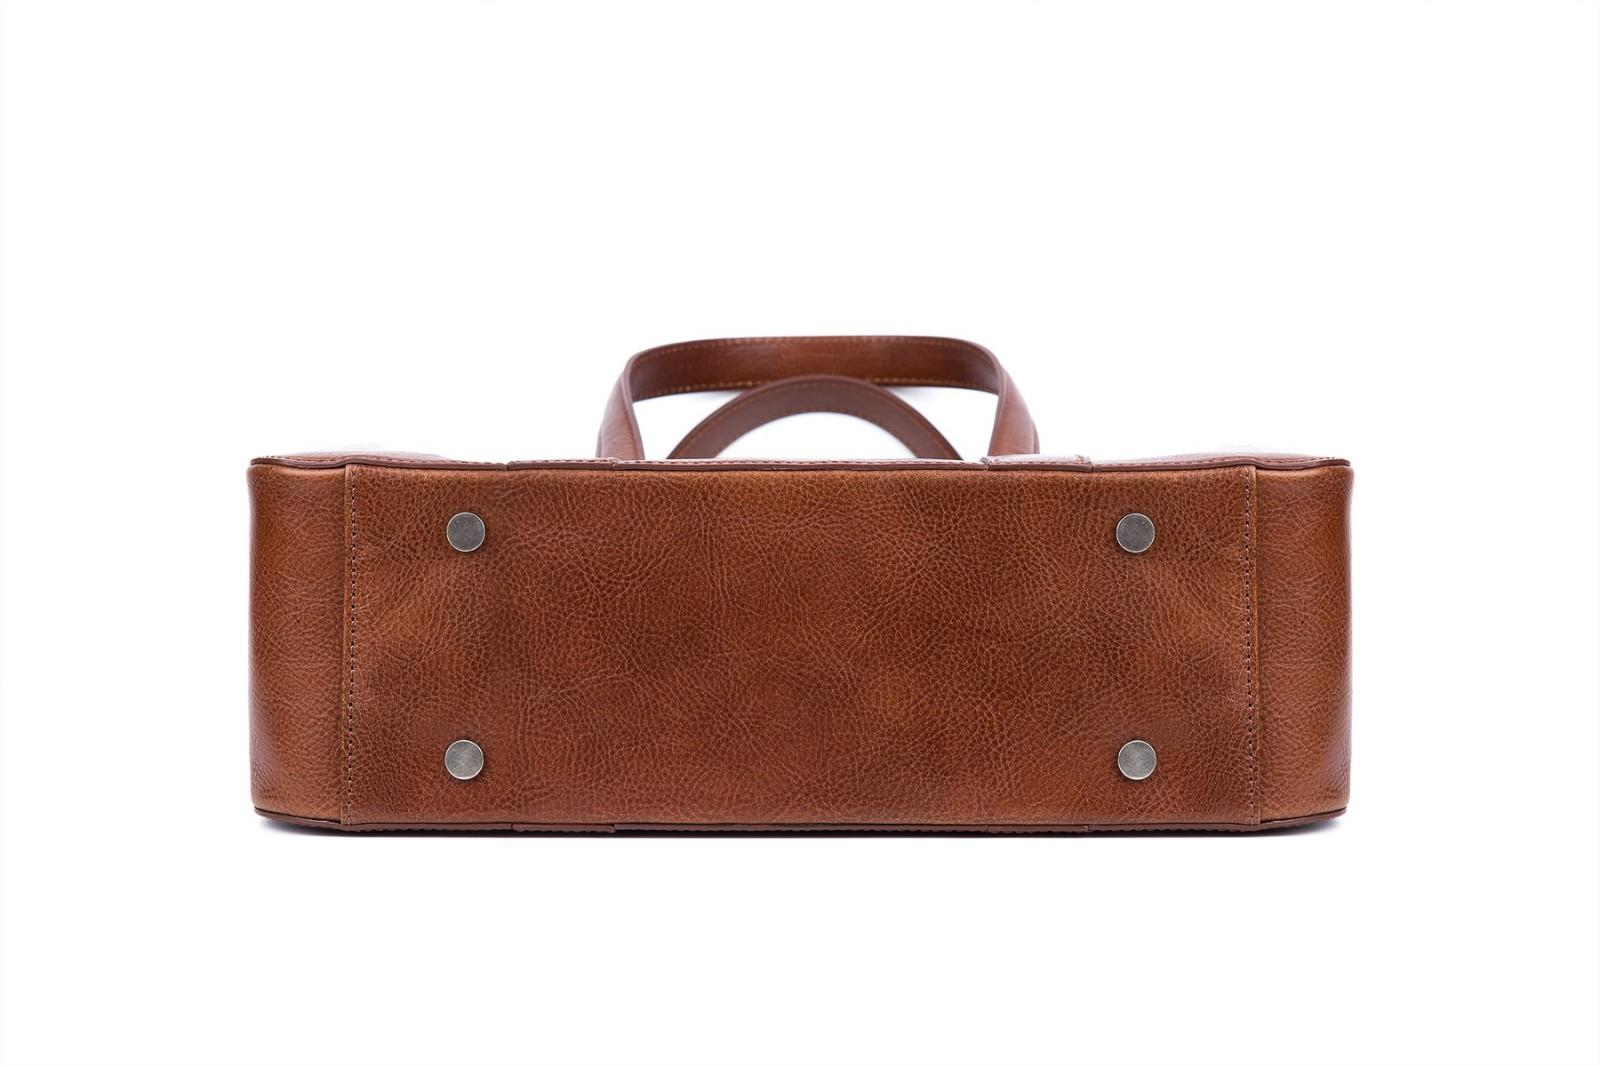 GF bags-Latest Handbags | Handbag Top Handle Waxed Leather Zipper Close Bag - Gaofeng-8